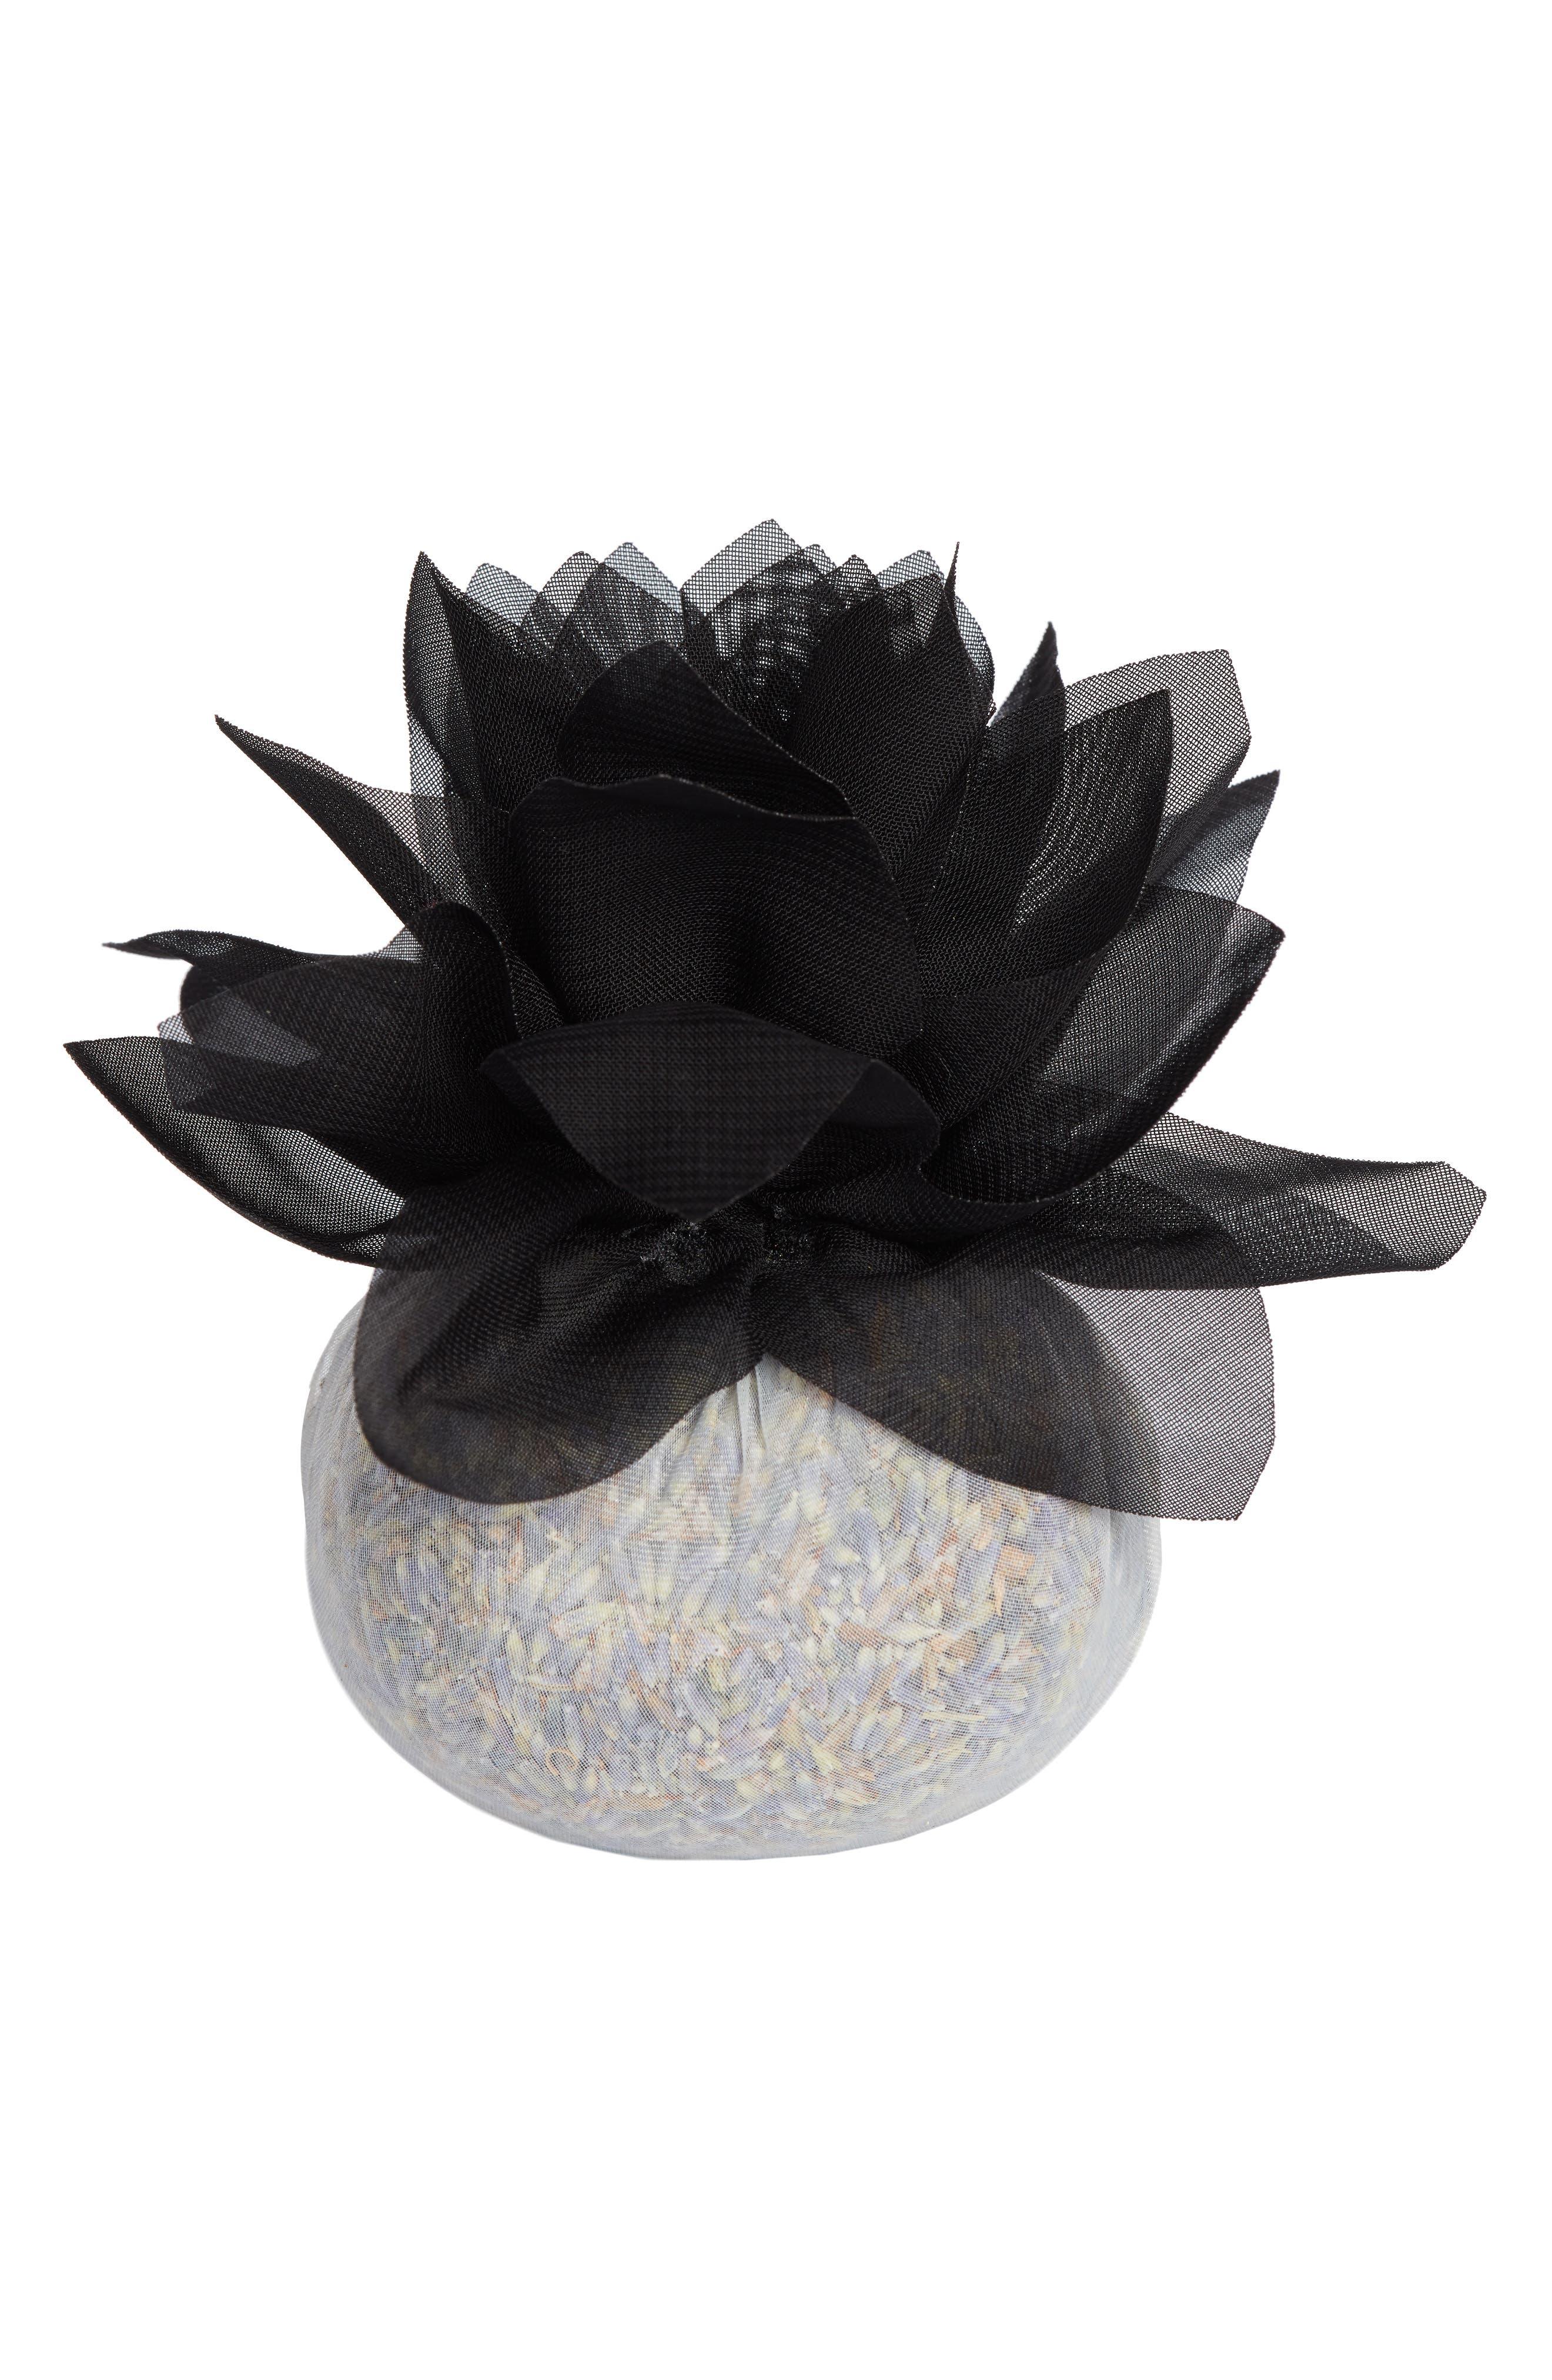 Stonehide Flower Sachet,                             Main thumbnail 1, color,                             BLACK